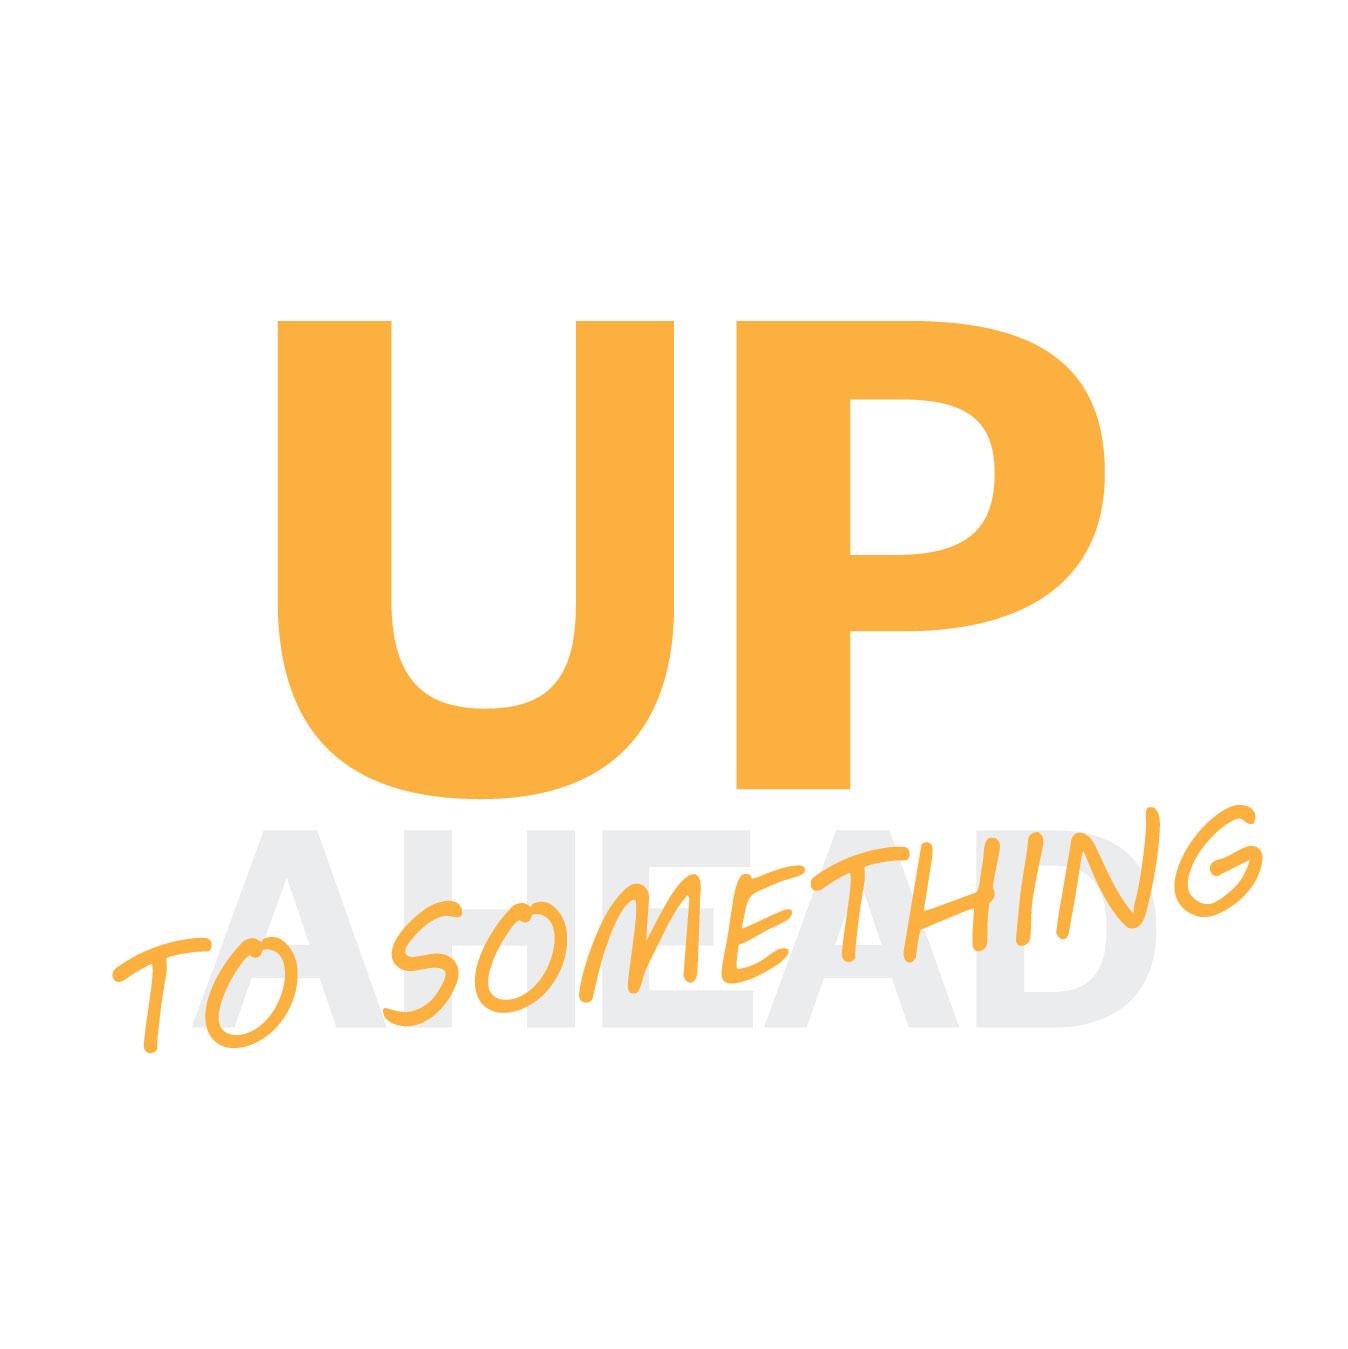 UP-To-Something-Page-Filler.jpg